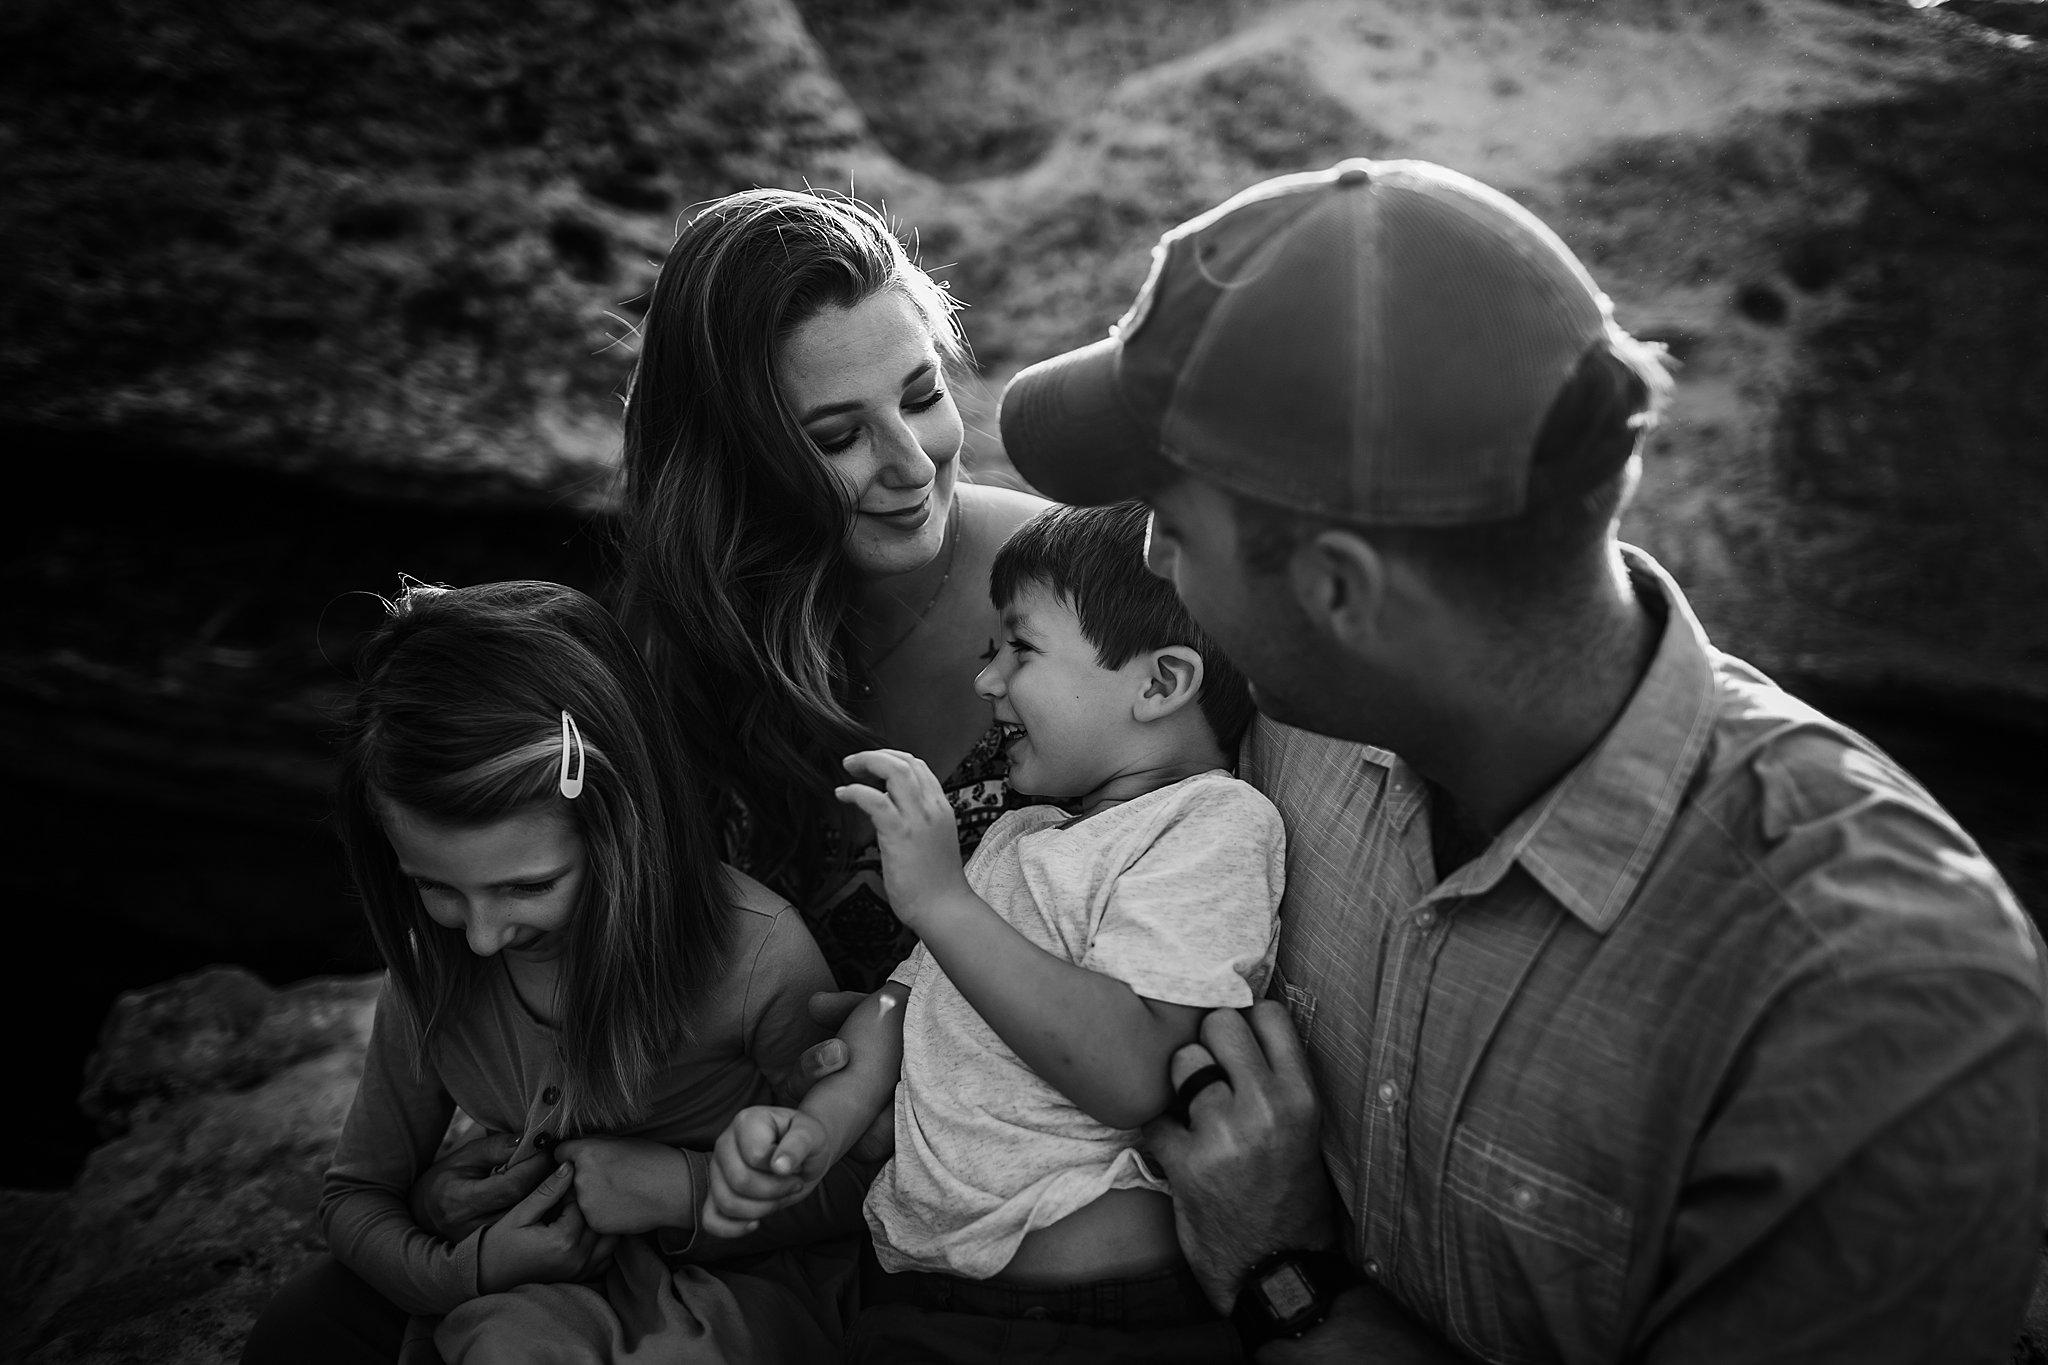 Tunnell-San-Antonio-Family-Photographer-10_WEB.jpg